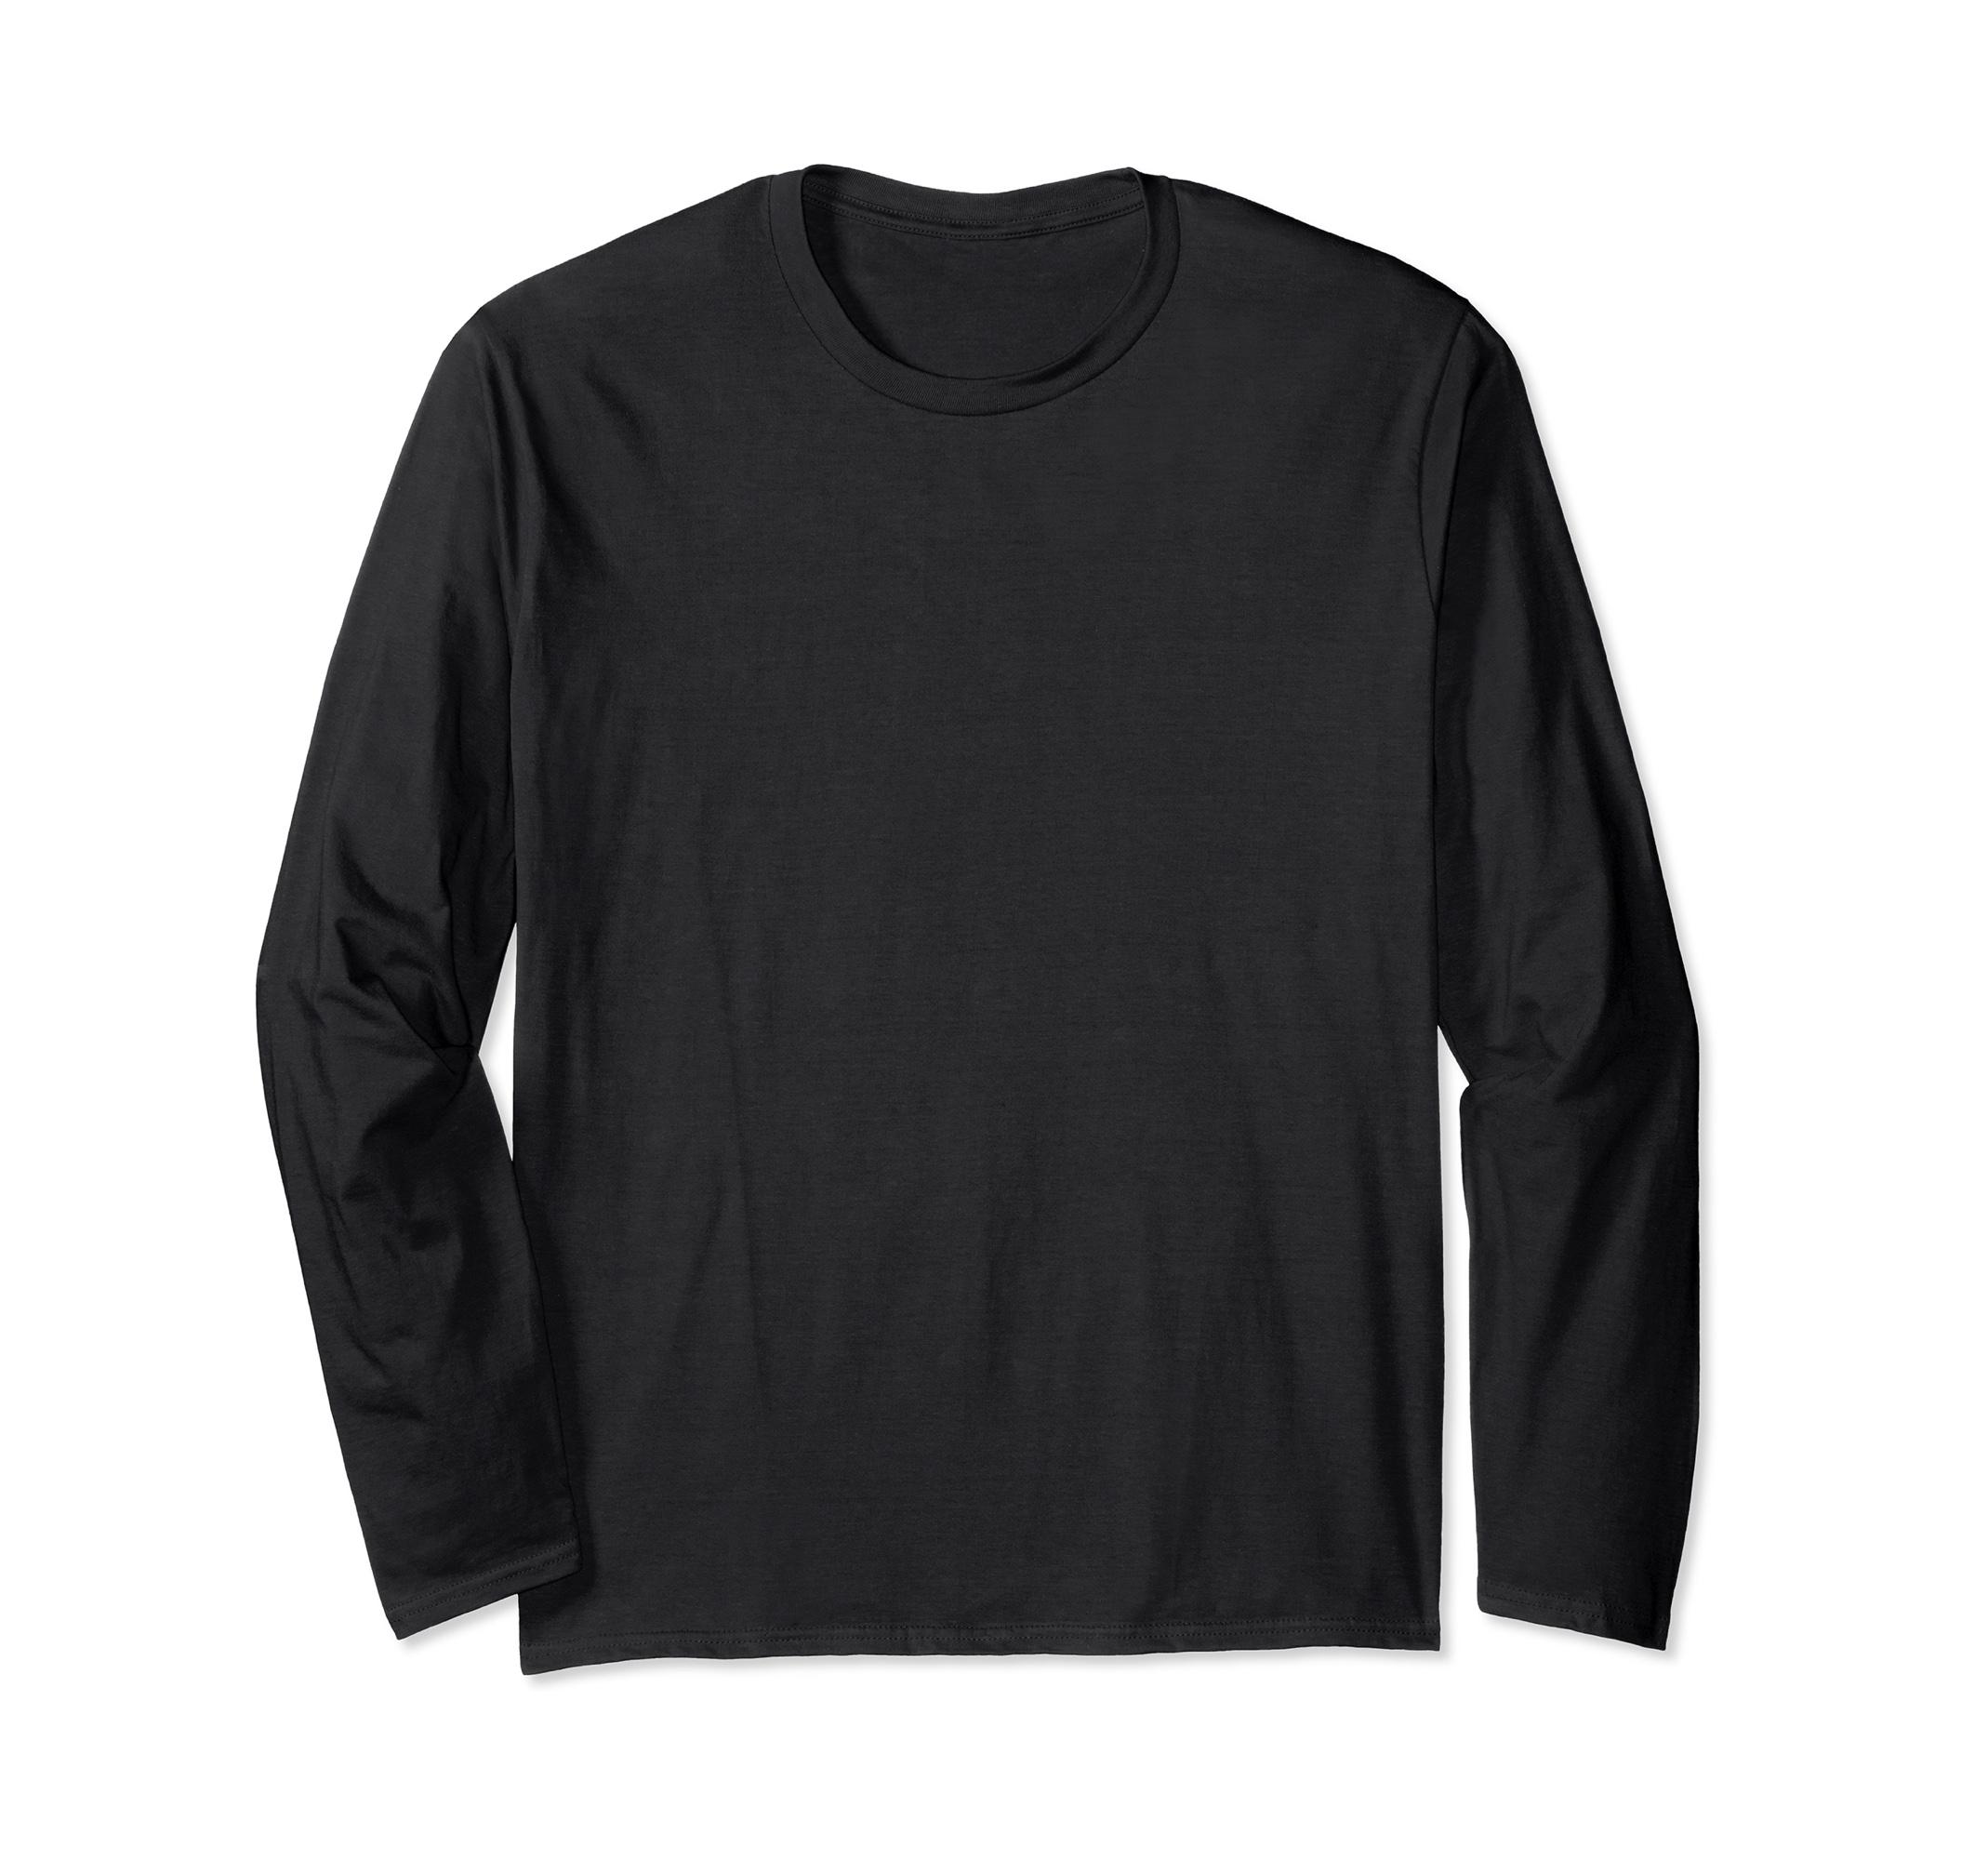 tee As an April Girl I Am The Kind of Woman Women Sweatshirt